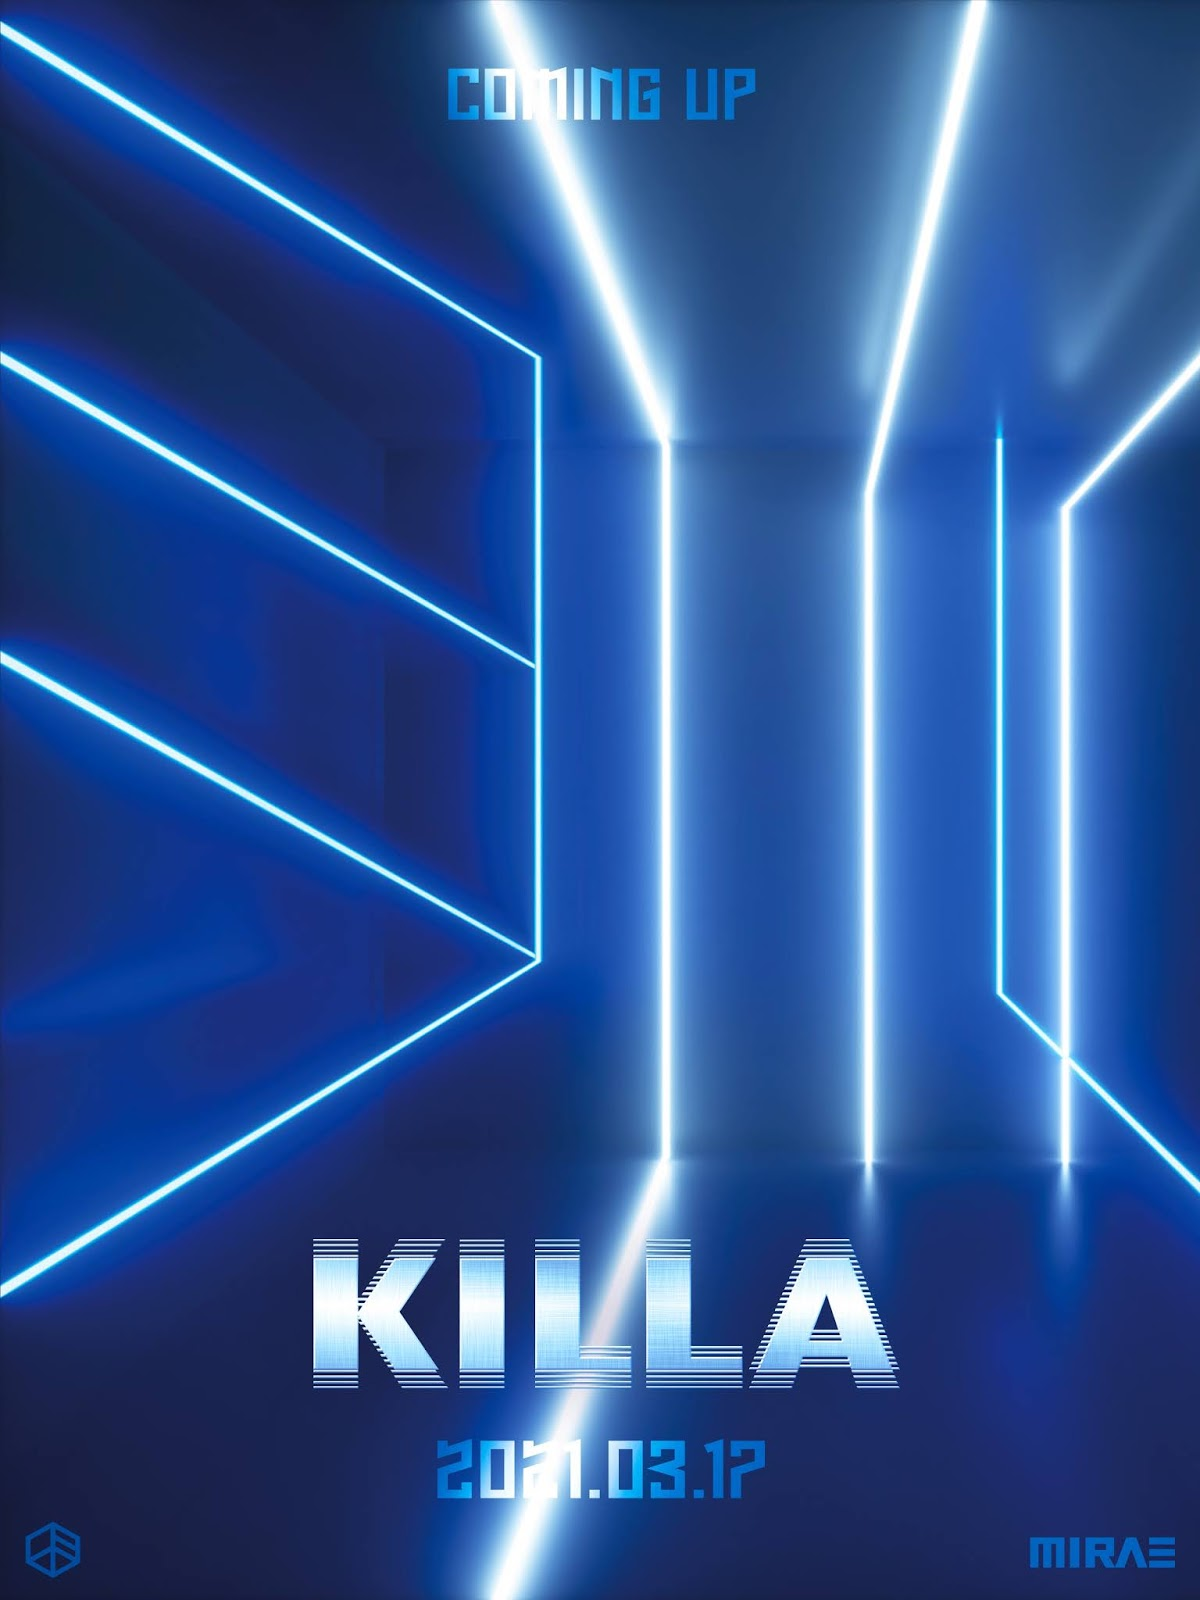 mirae debut killa